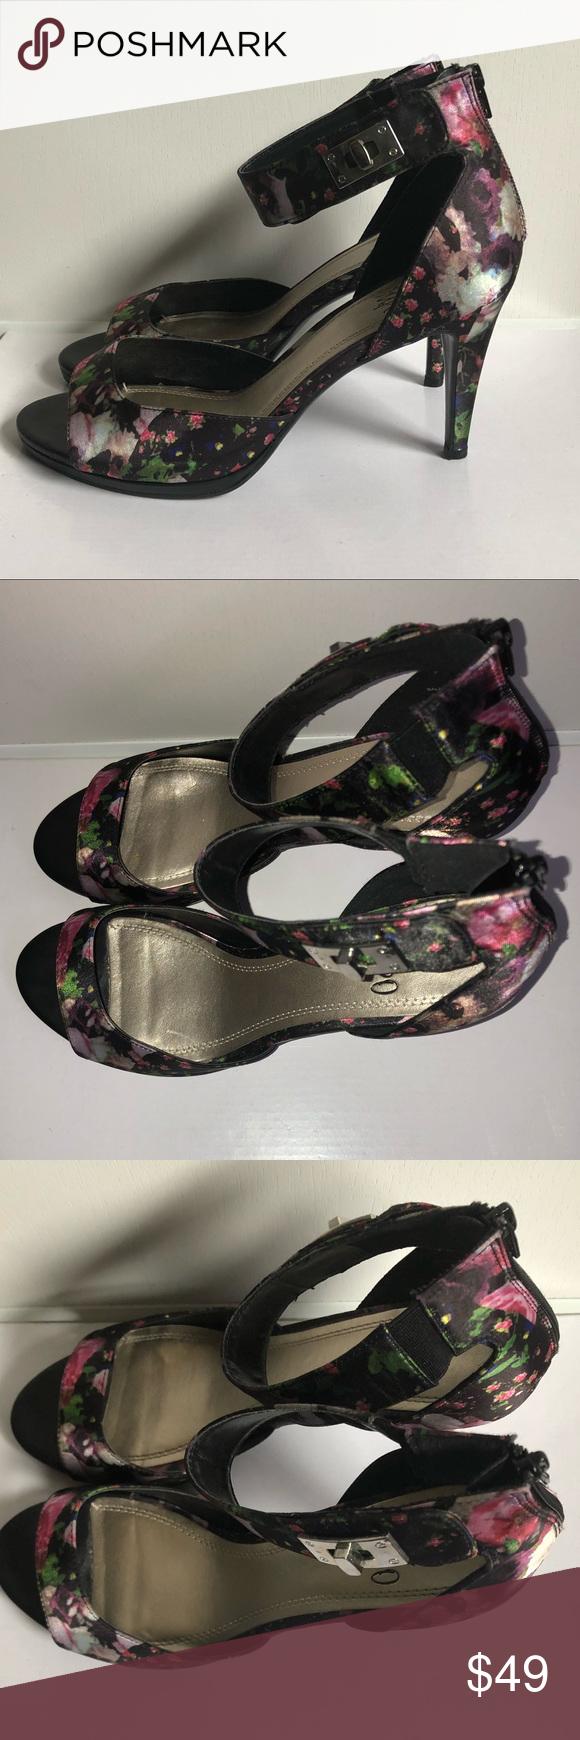 DexFlex WhiteCork Wedge Heels Ladies Sz 7.5